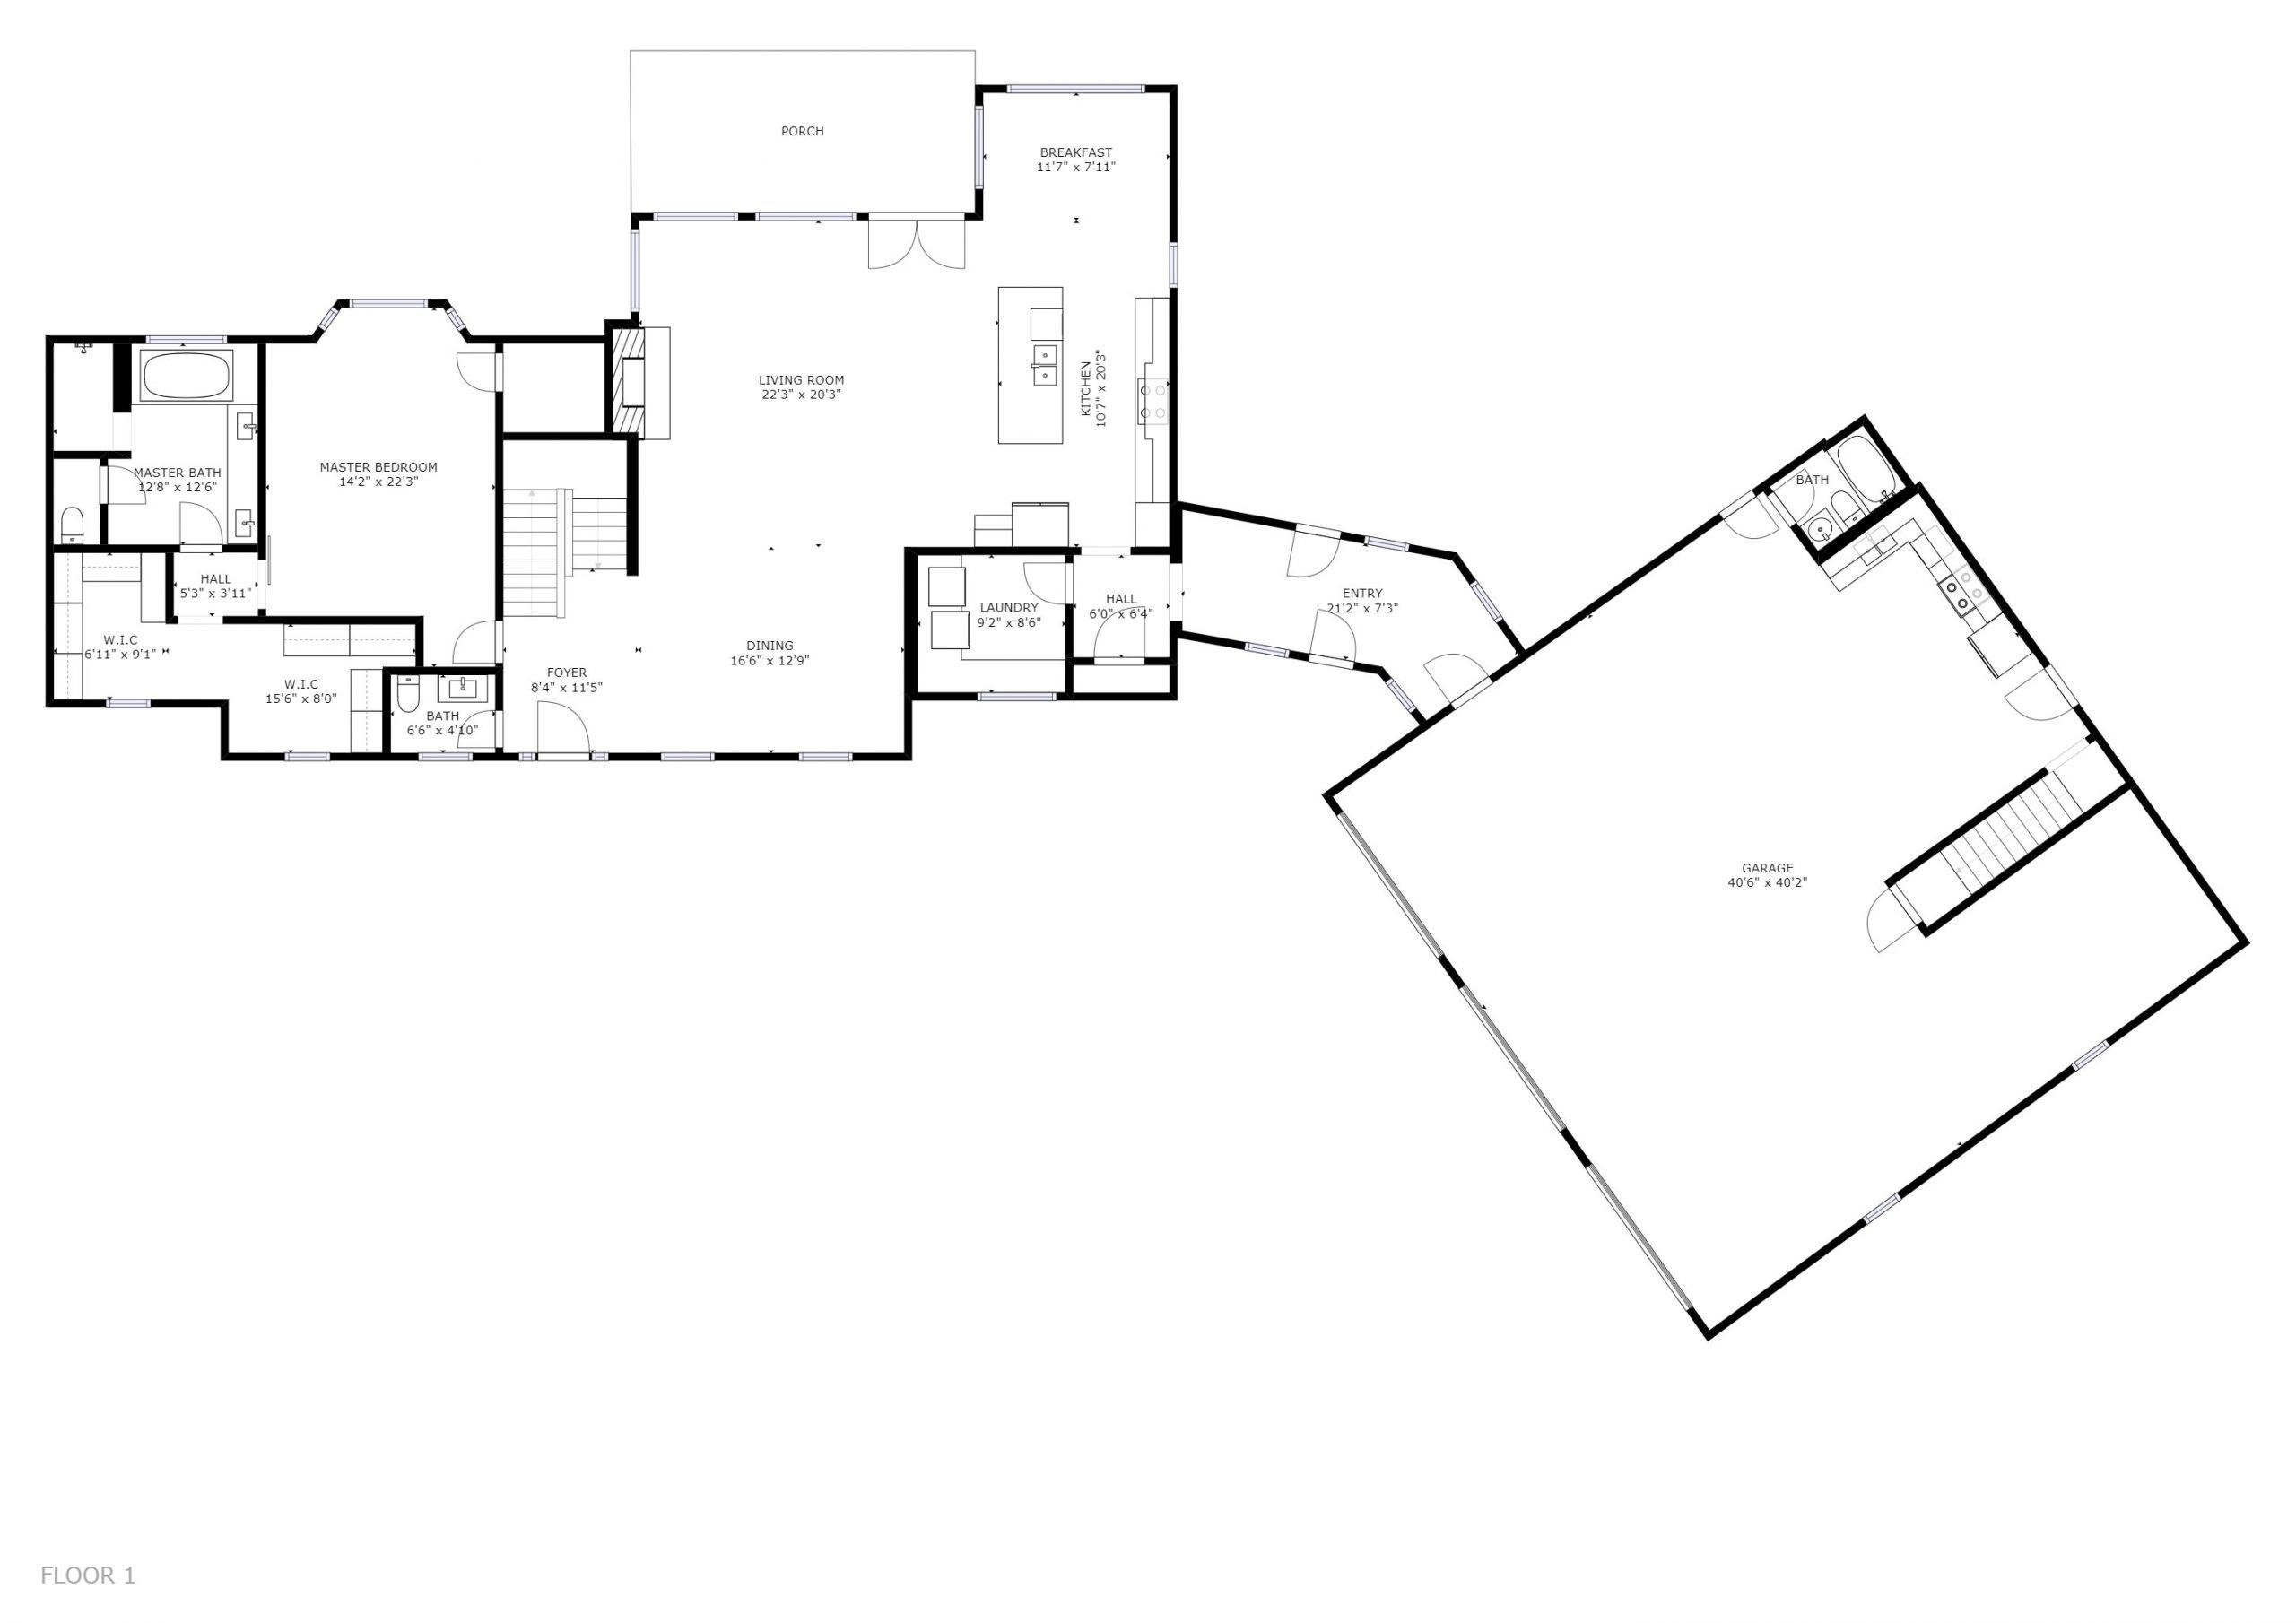 11634 TURKEY CREEK ROAD KNOXVILLE, TN 37934 - Floor Plan 1